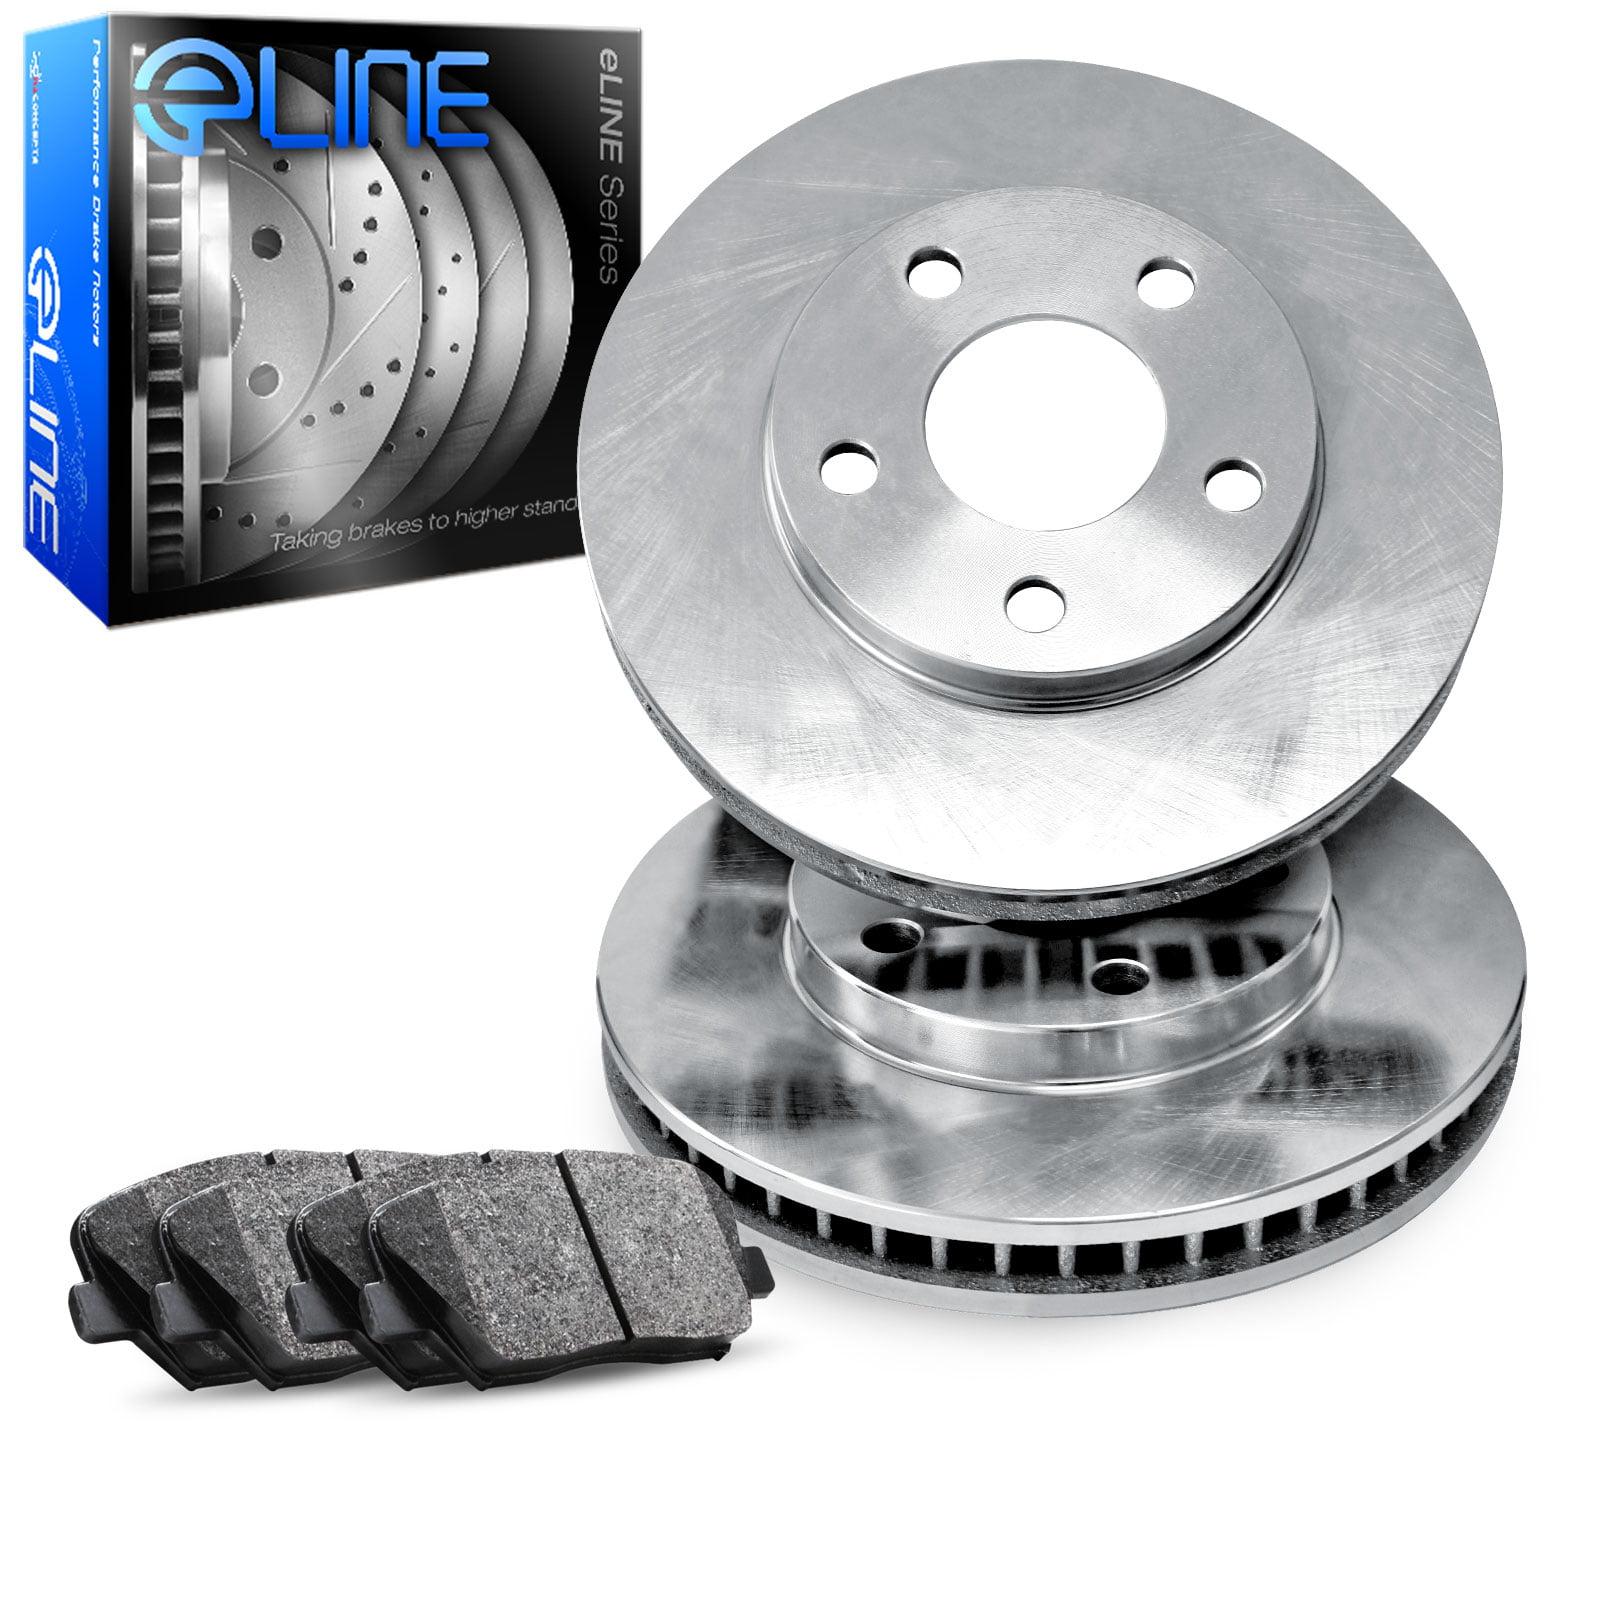 2012 2013 2014 2015 2016 Ford Focus Front Eline Plain Brake Disc Rotors Ceramic Brake Pads